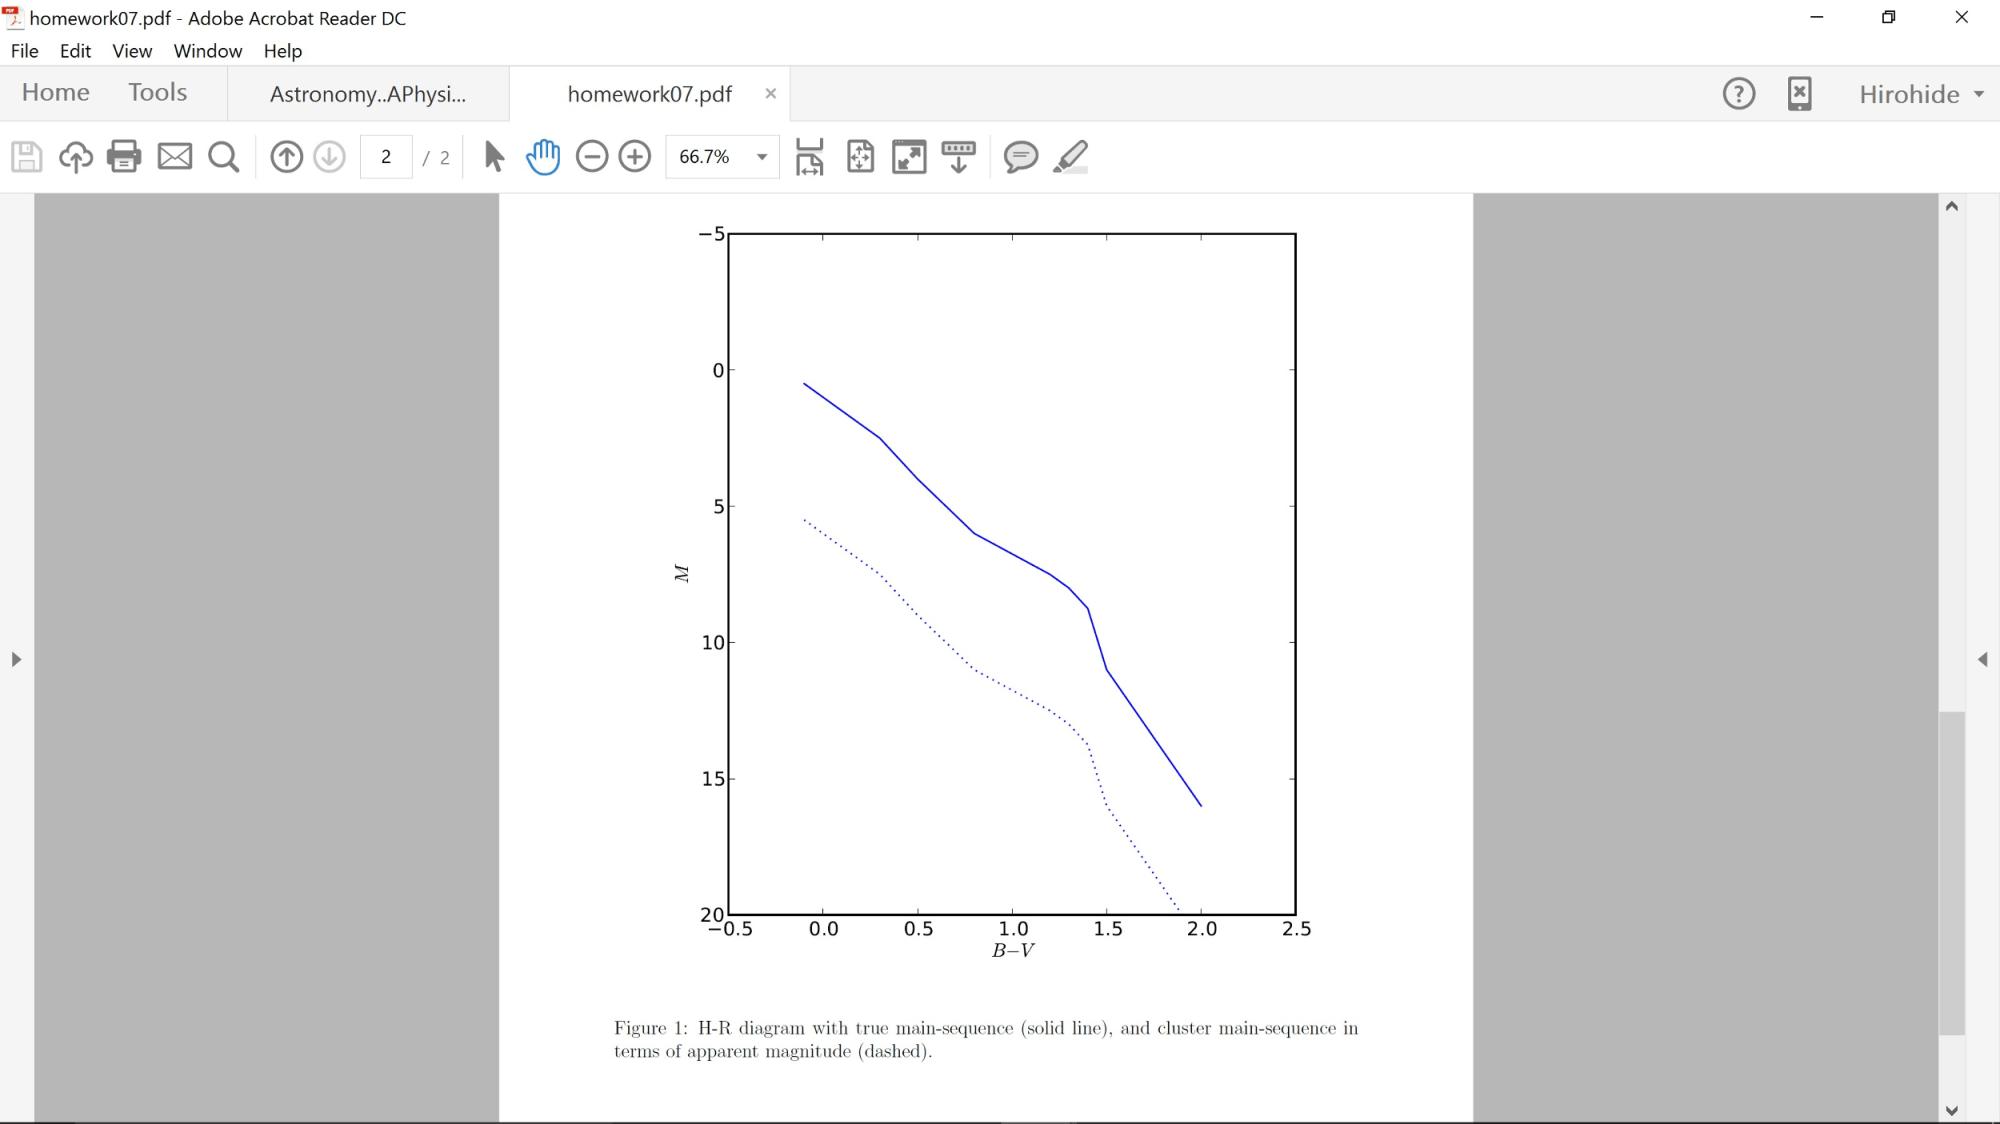 hight resolution of 4 homework07 pdf adobe acrobat reader dc file edit view window help hirohide hirohide consider the attached hr diagram